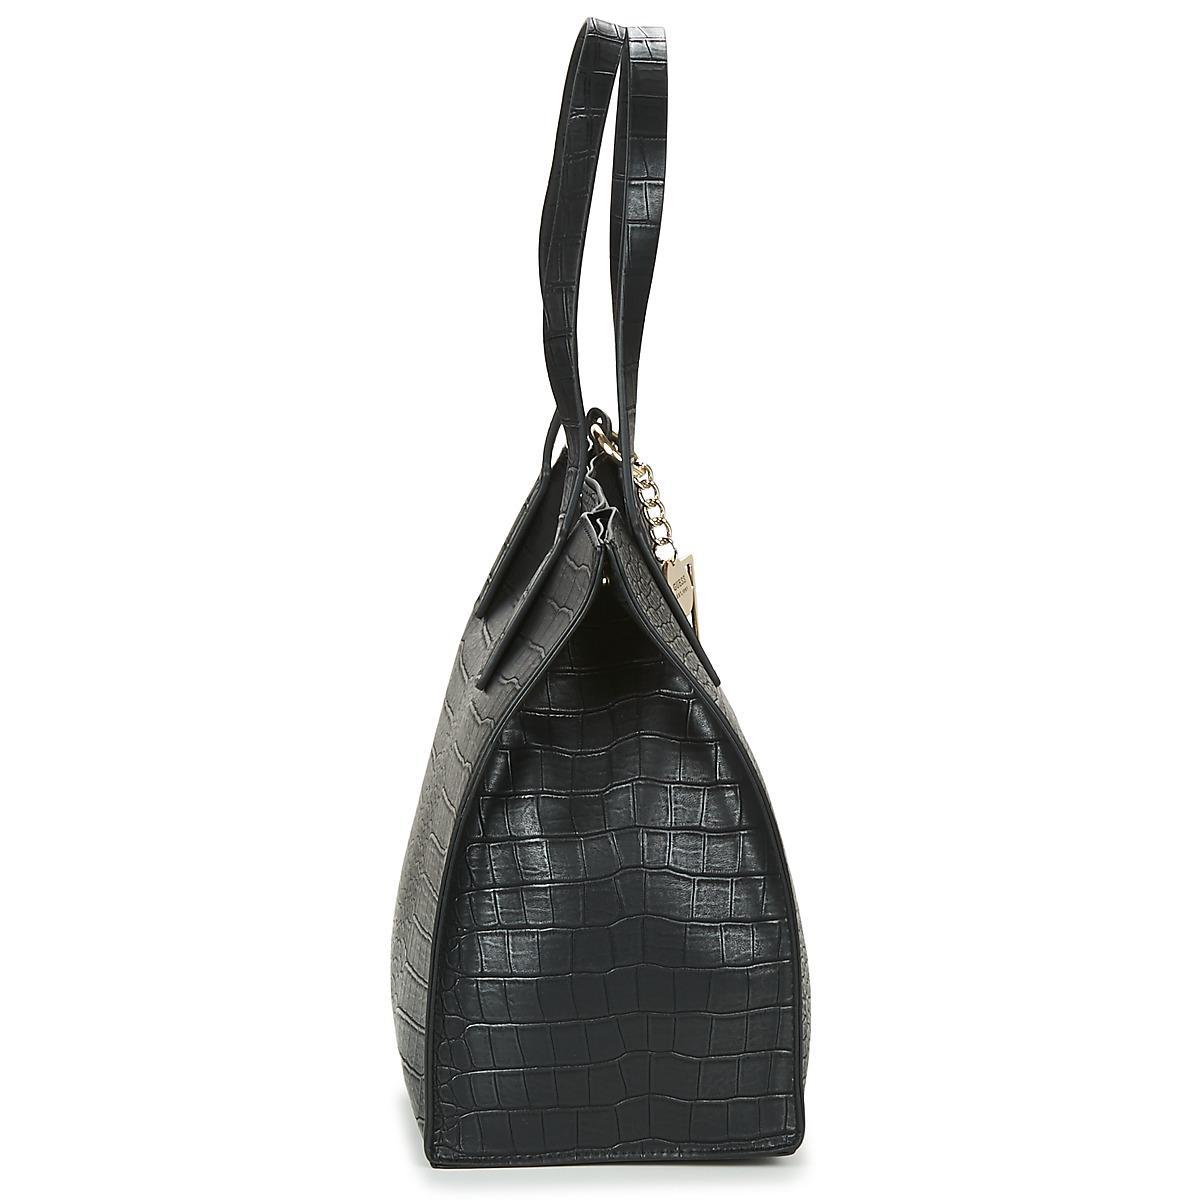 F0u7w Guess Carryall Women's Bag Lyst Kinley In Shopper Black qAx8zR